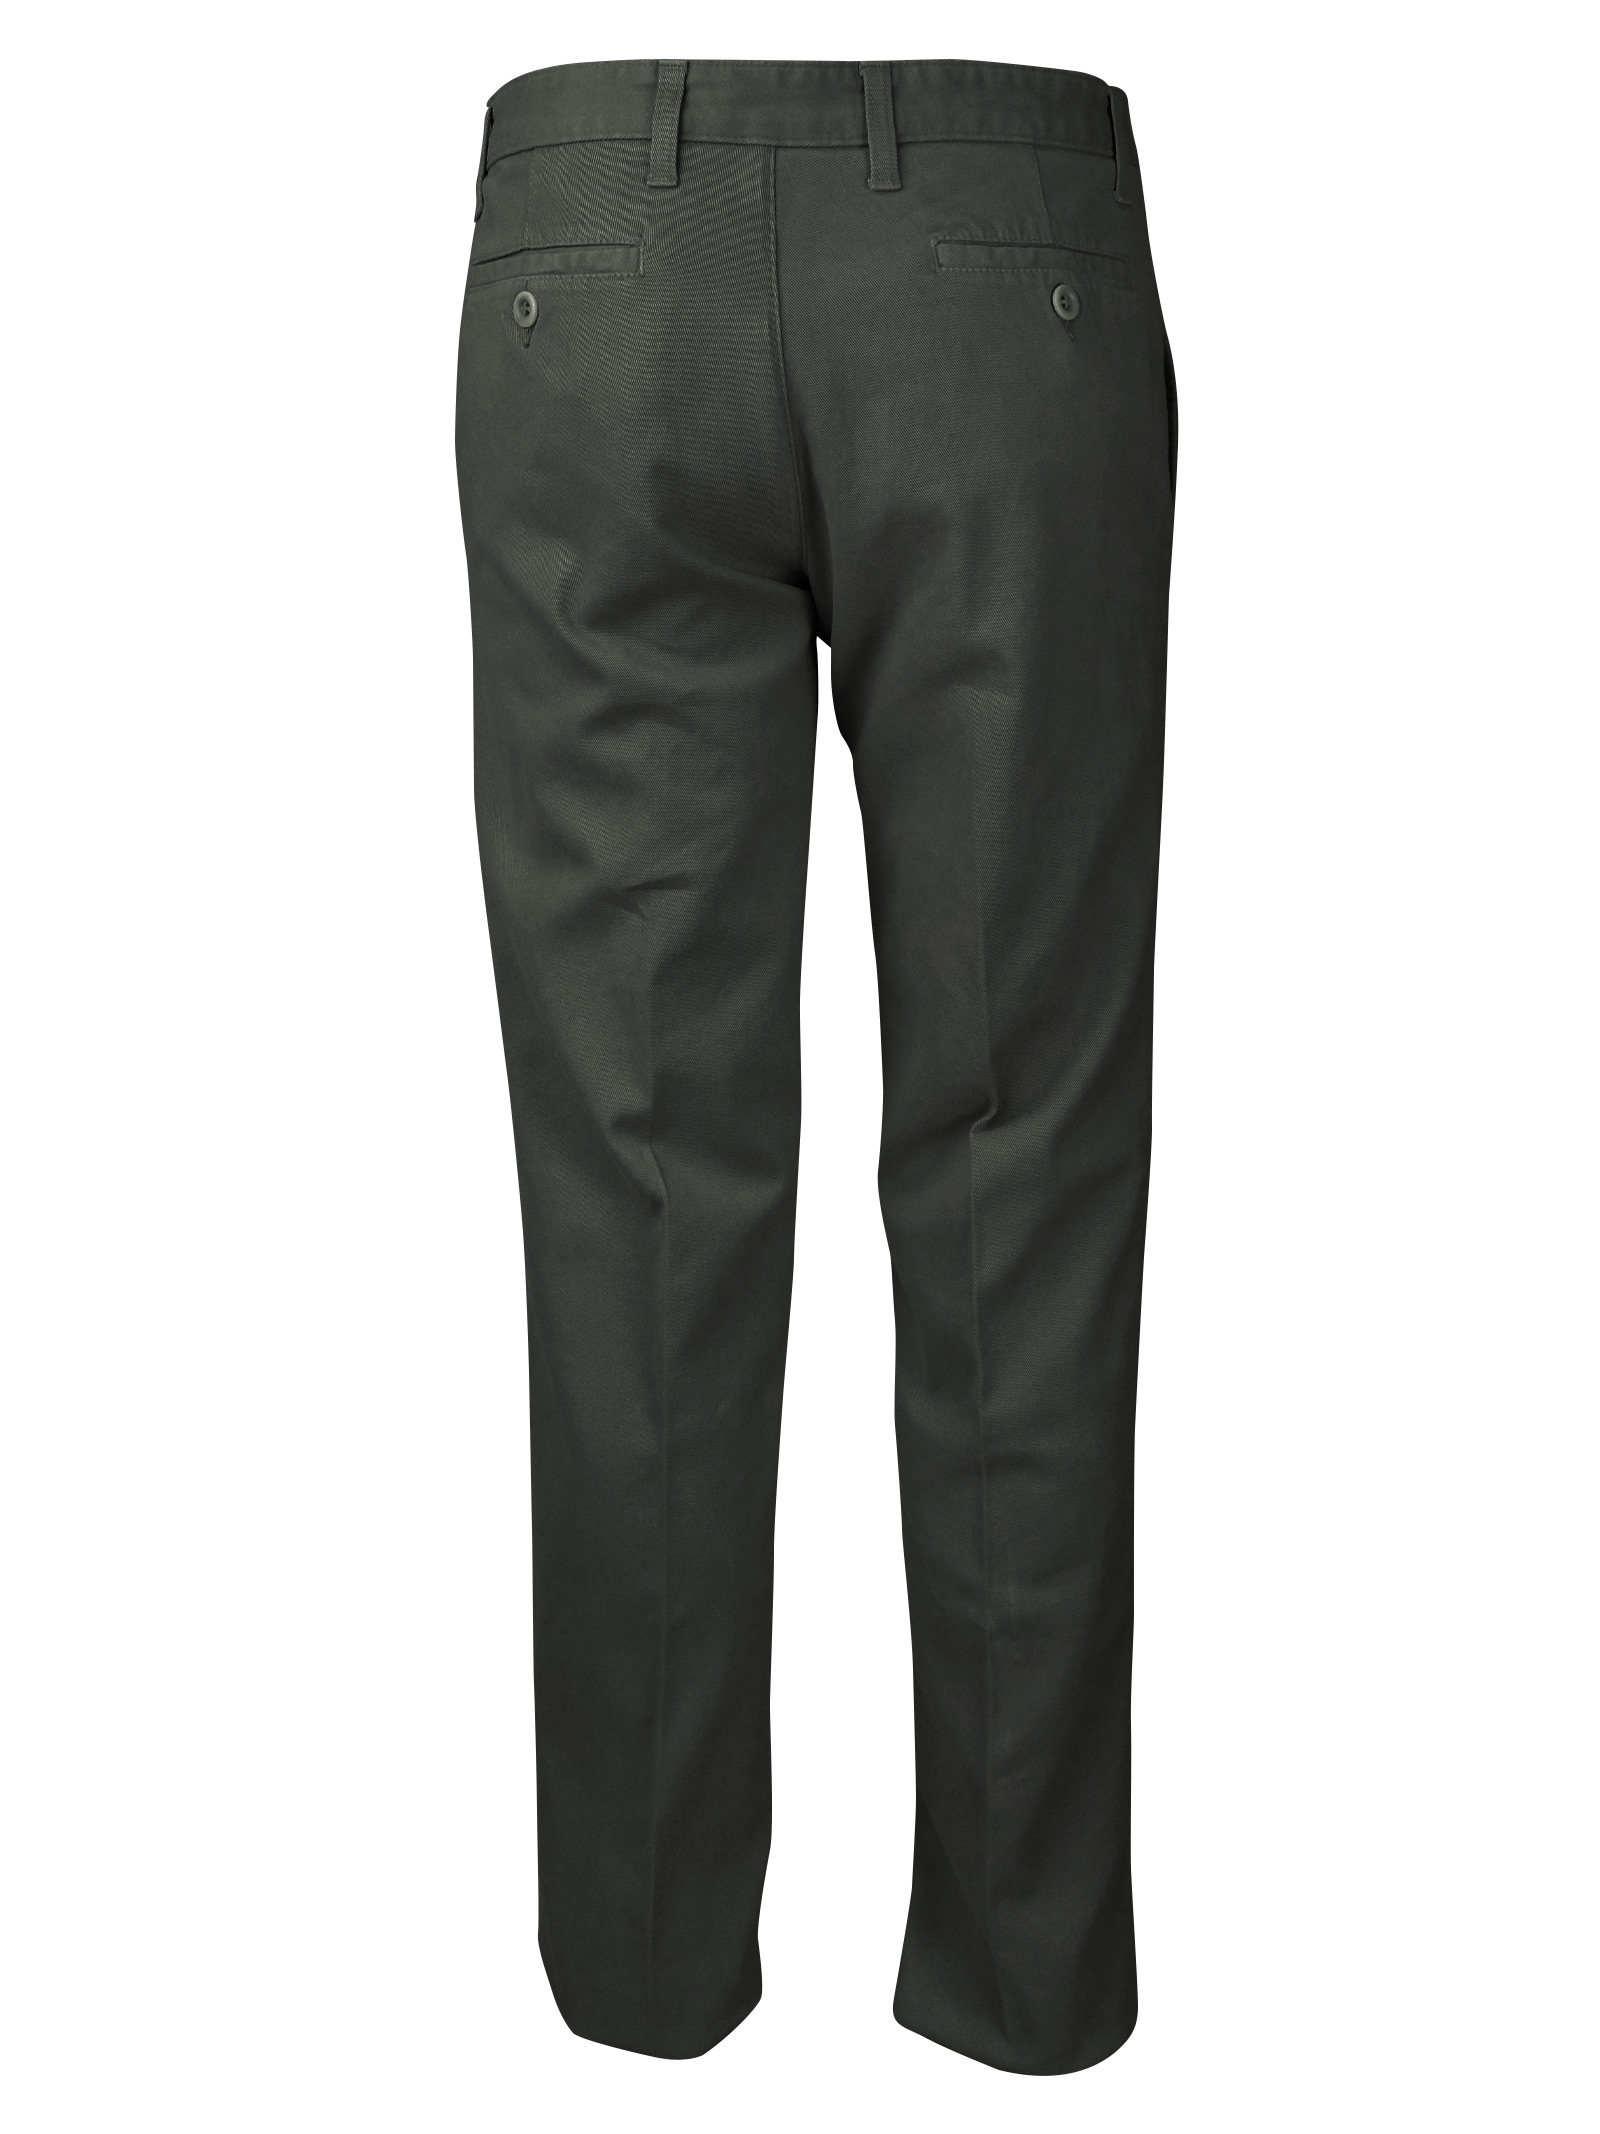 PANTS PANAMA JACKET | Trousers | 74869